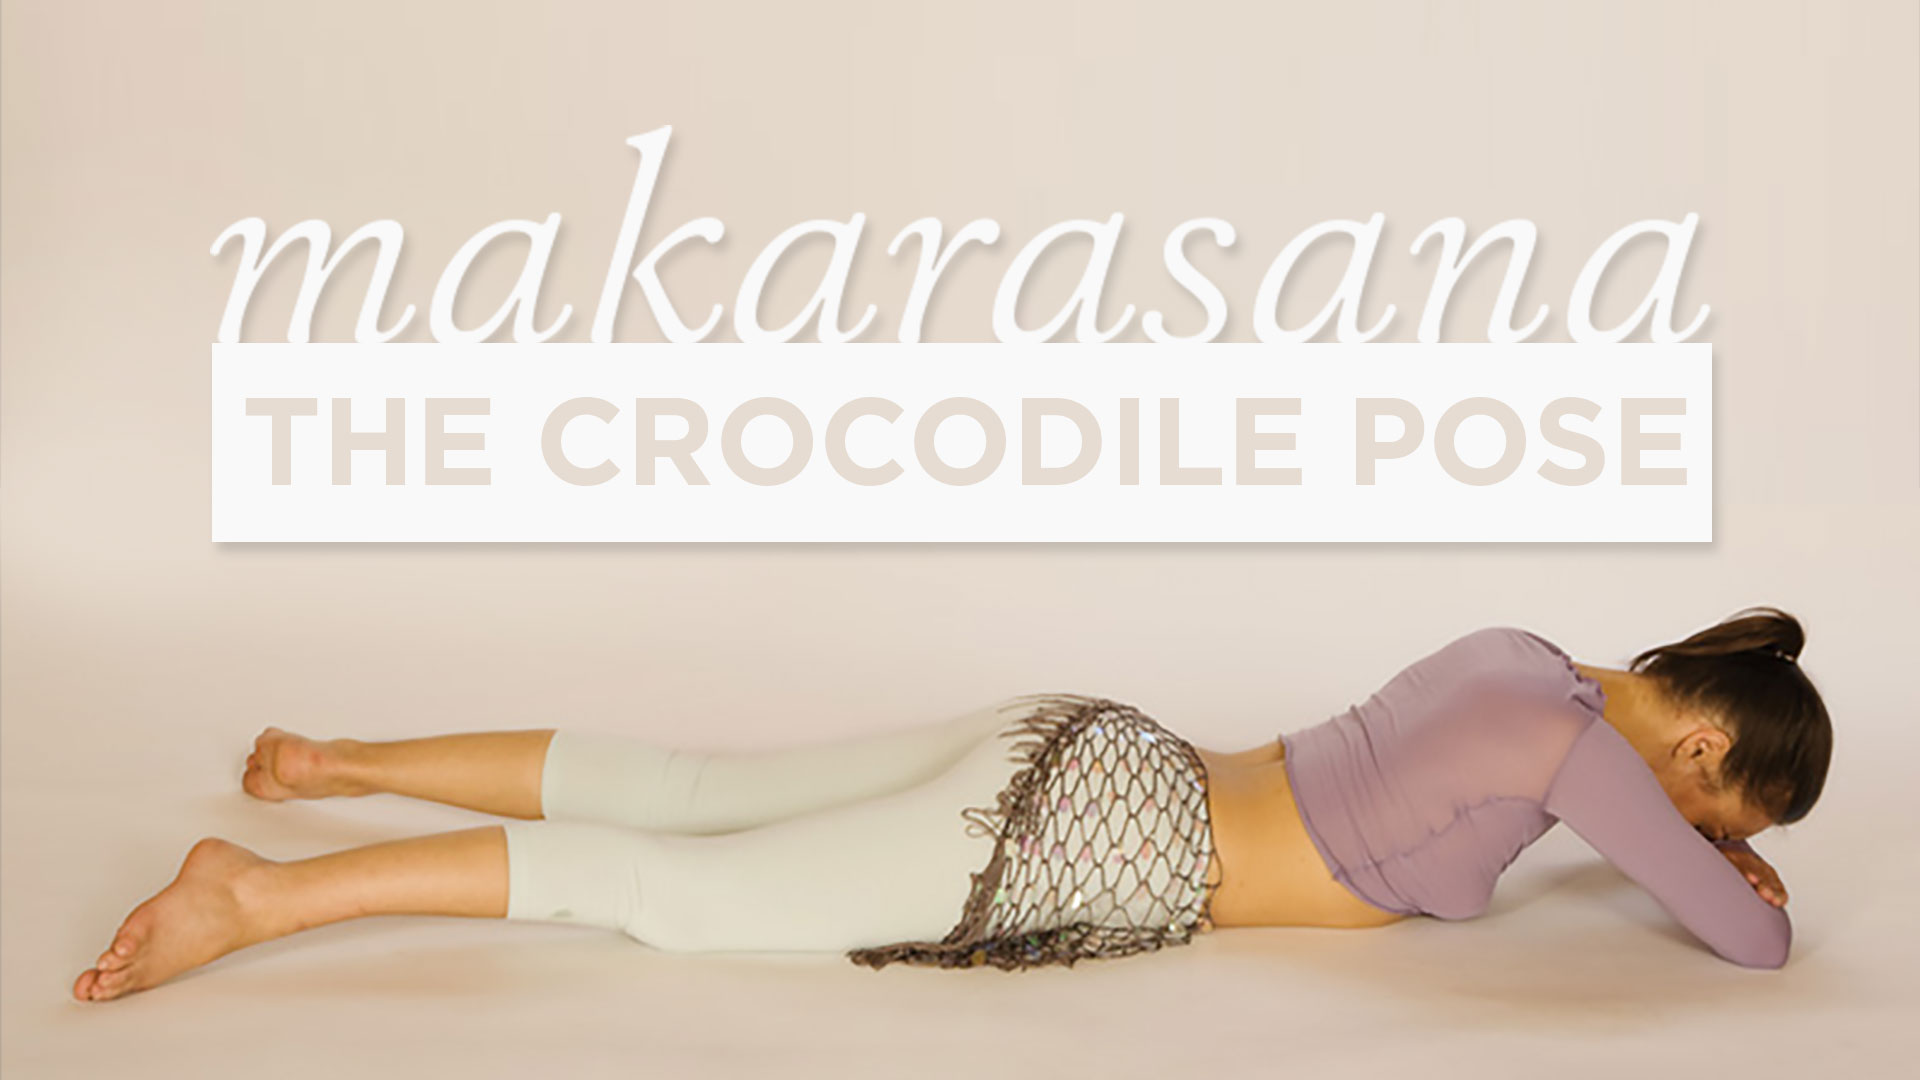 Makarasana The Crocodile Pose Yoga International